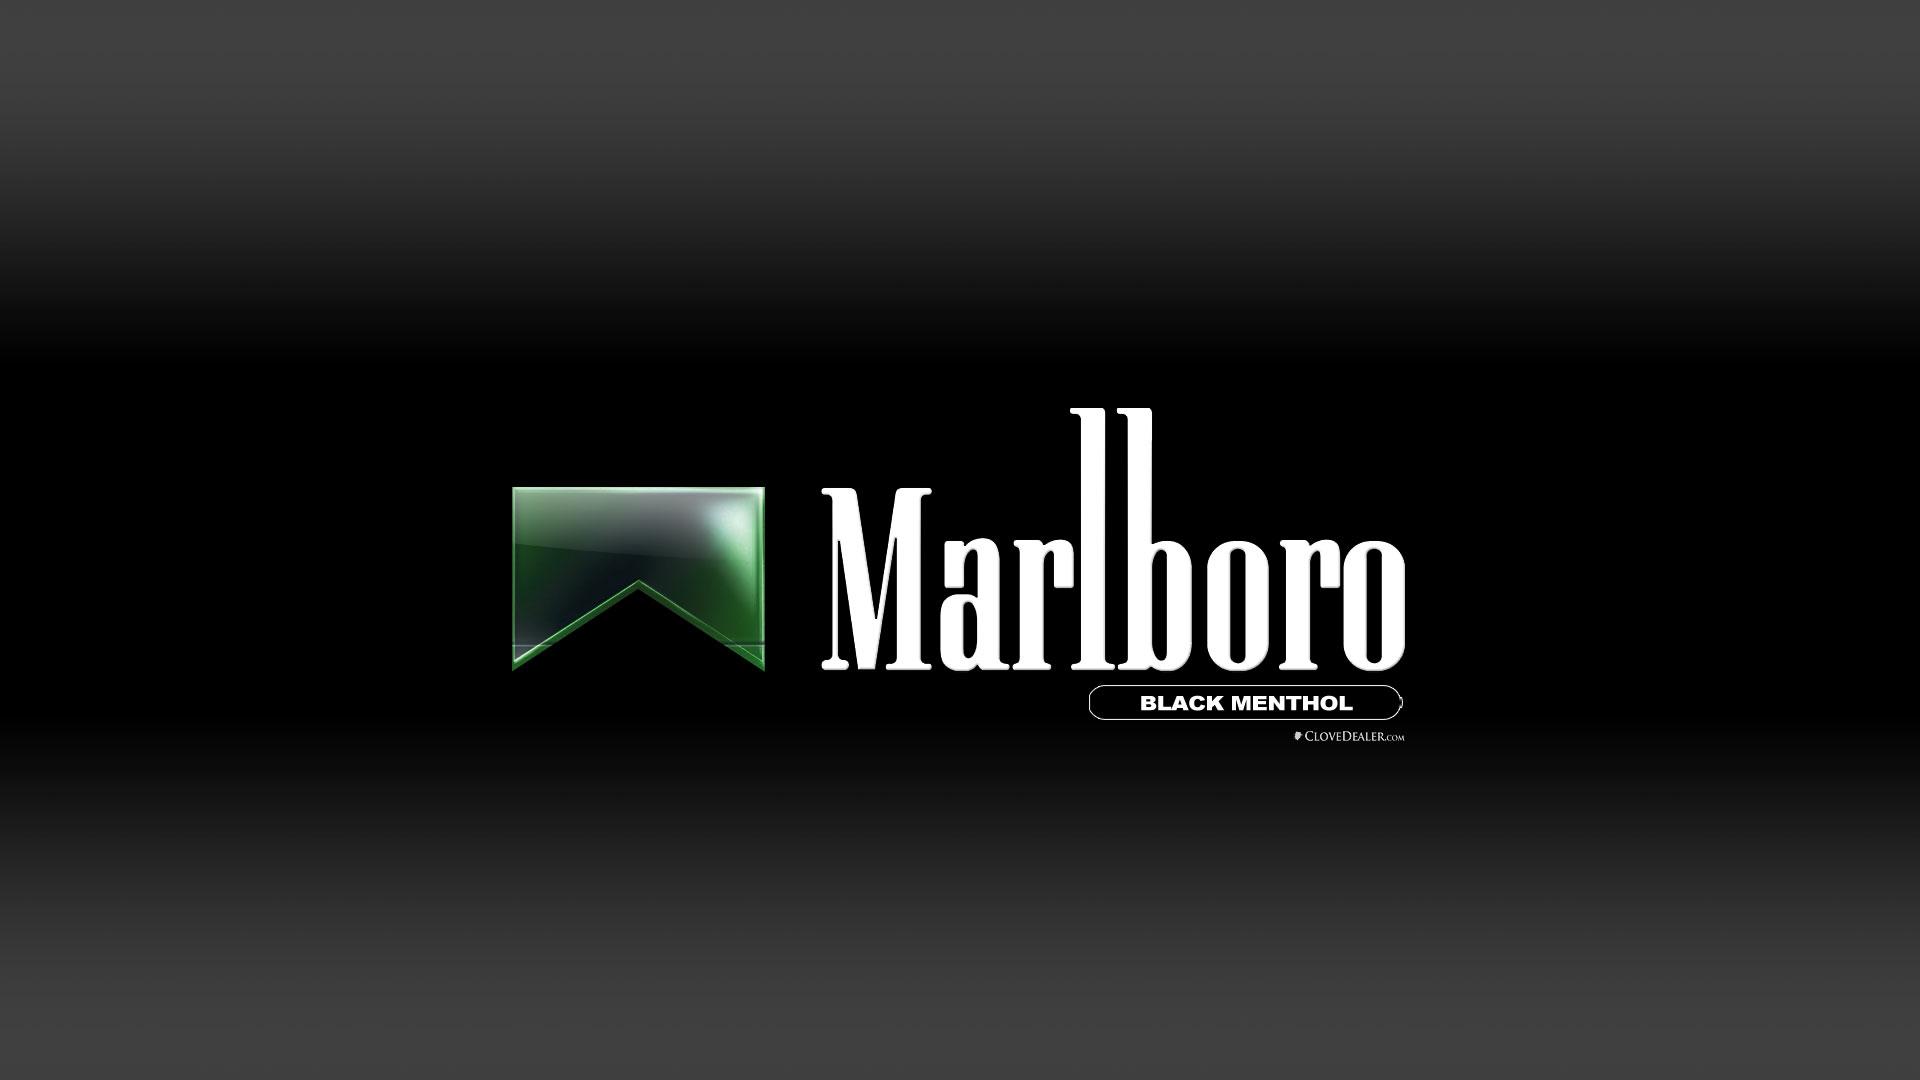 Marlboro Black Menthol Cigarettes Wallpaper HD by 1920x1080